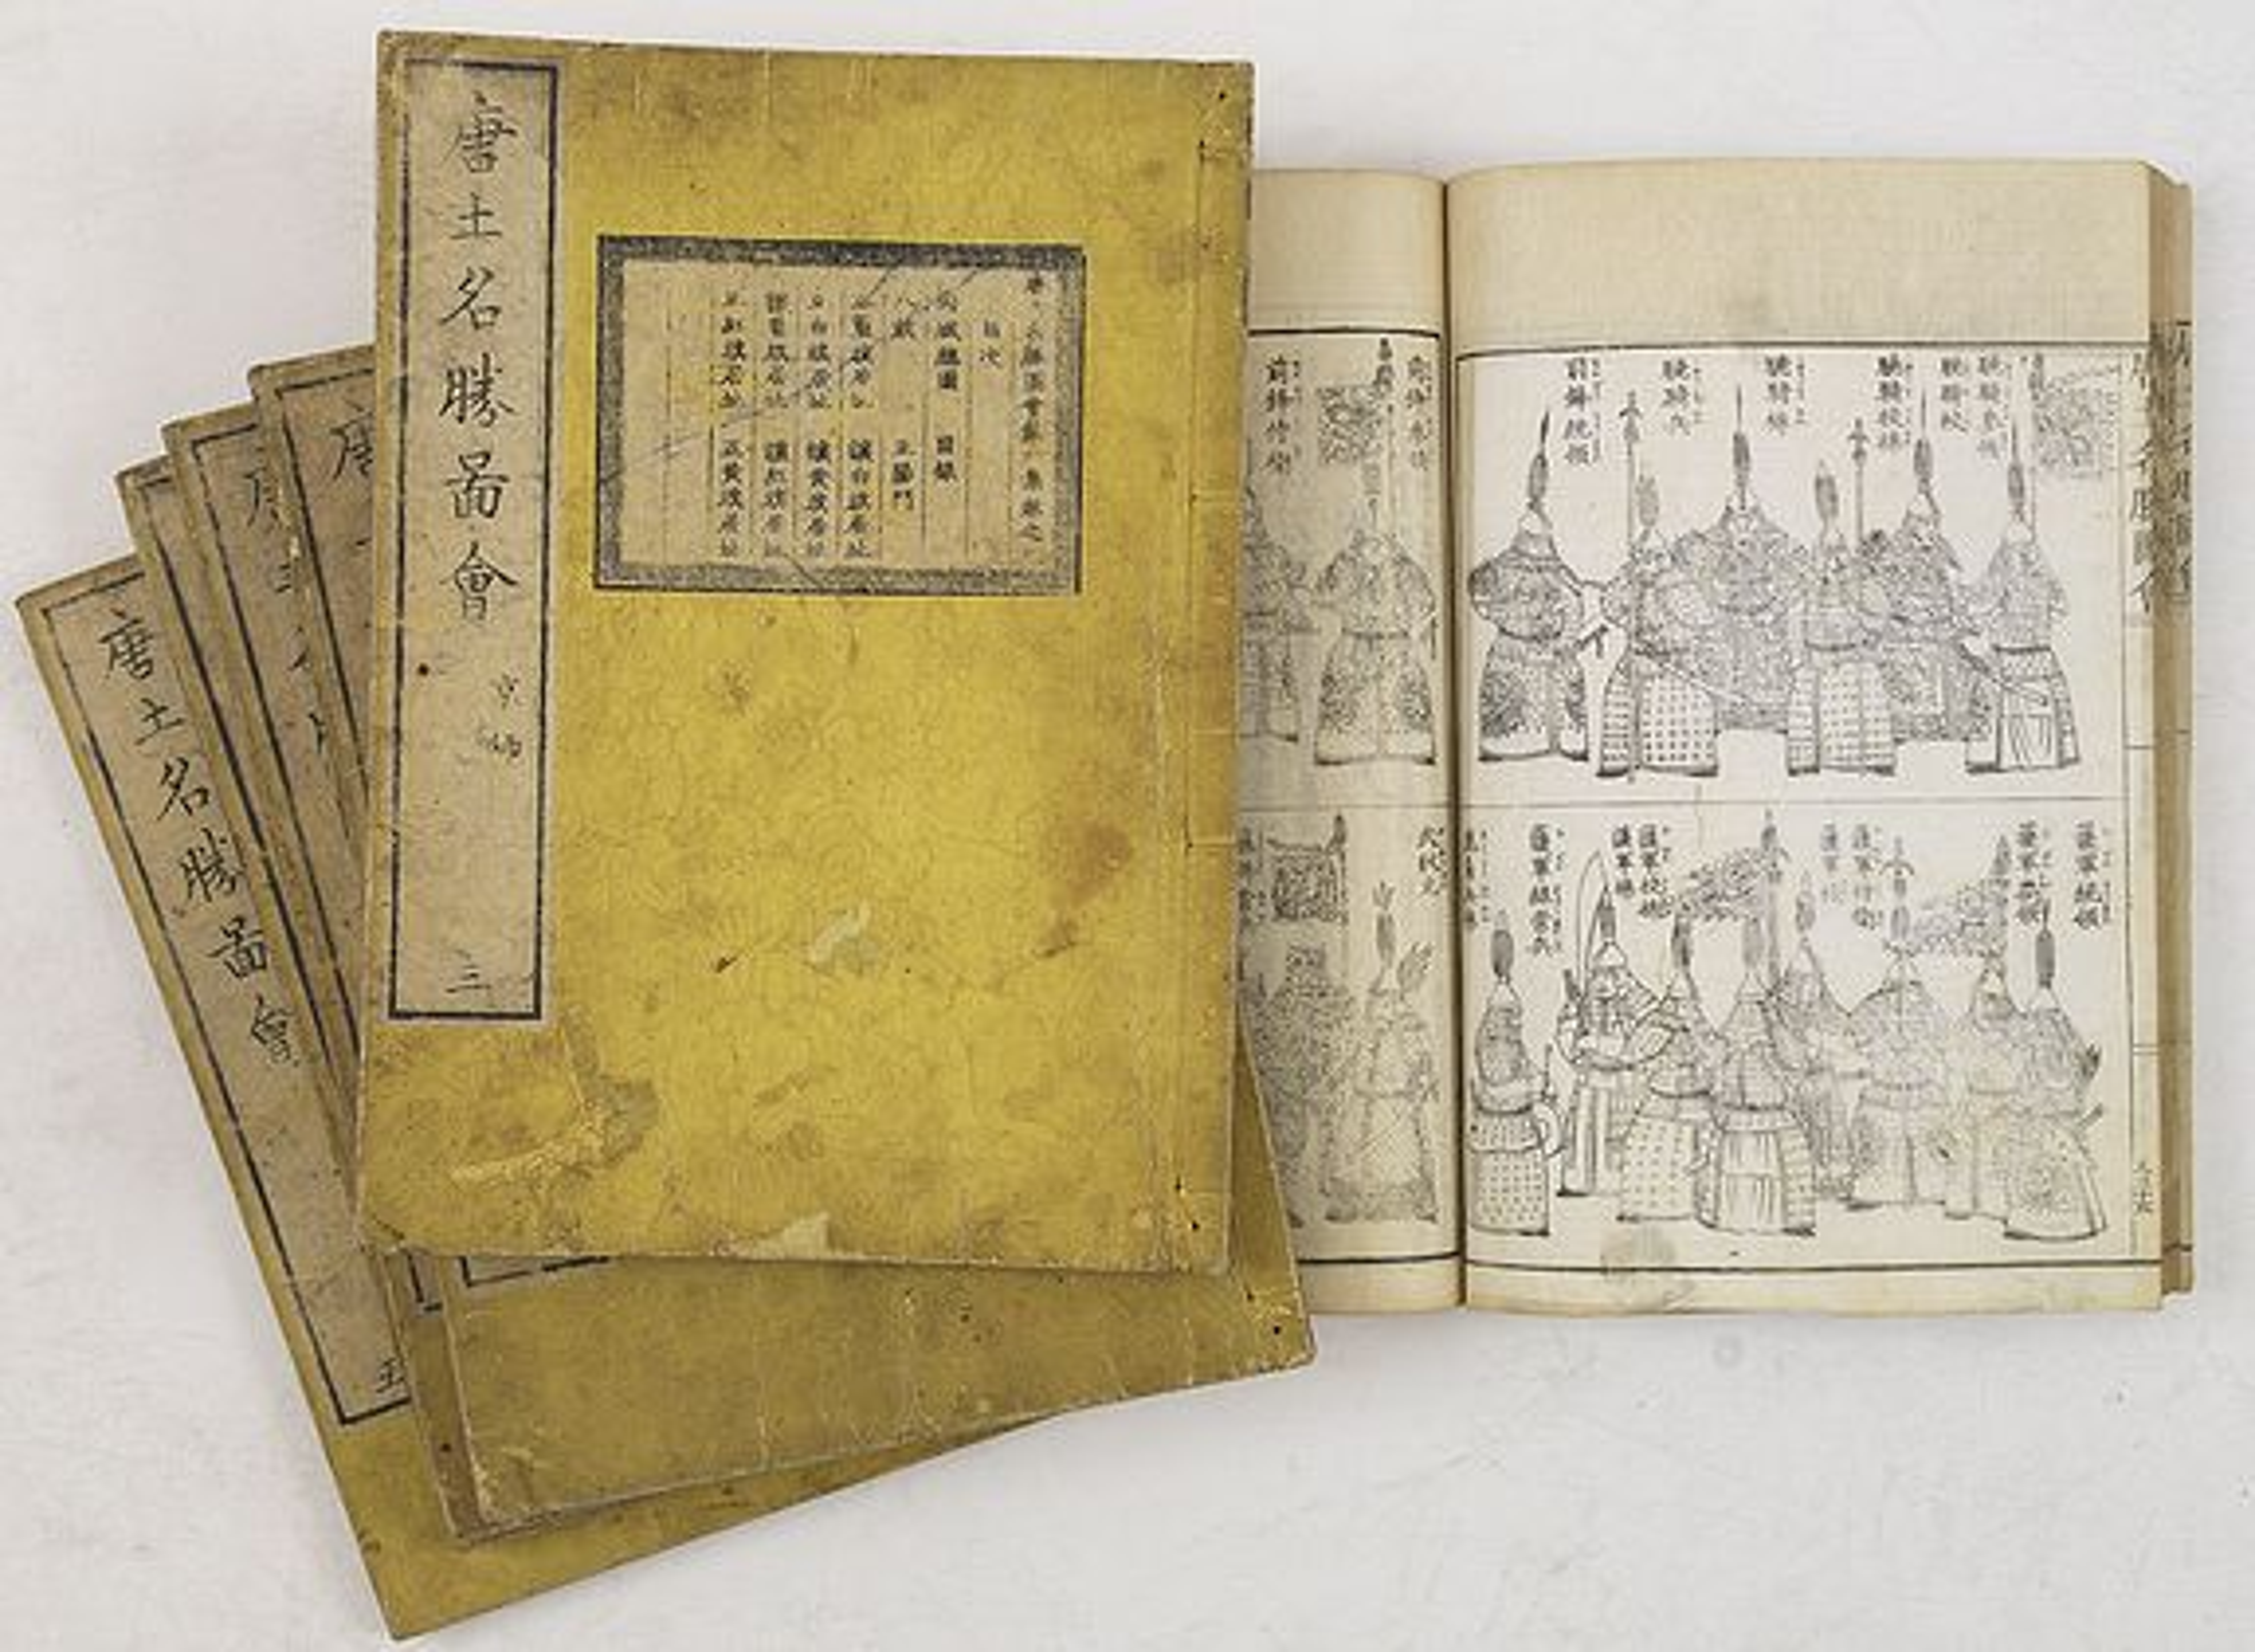 OKADA GYUKUZAN, OKA YUGAKU, OHARA TOYA MINSEI,  Morokoshi Meisho Zue [Illustrated Description of Famous Sites of China]., antique map, old maps